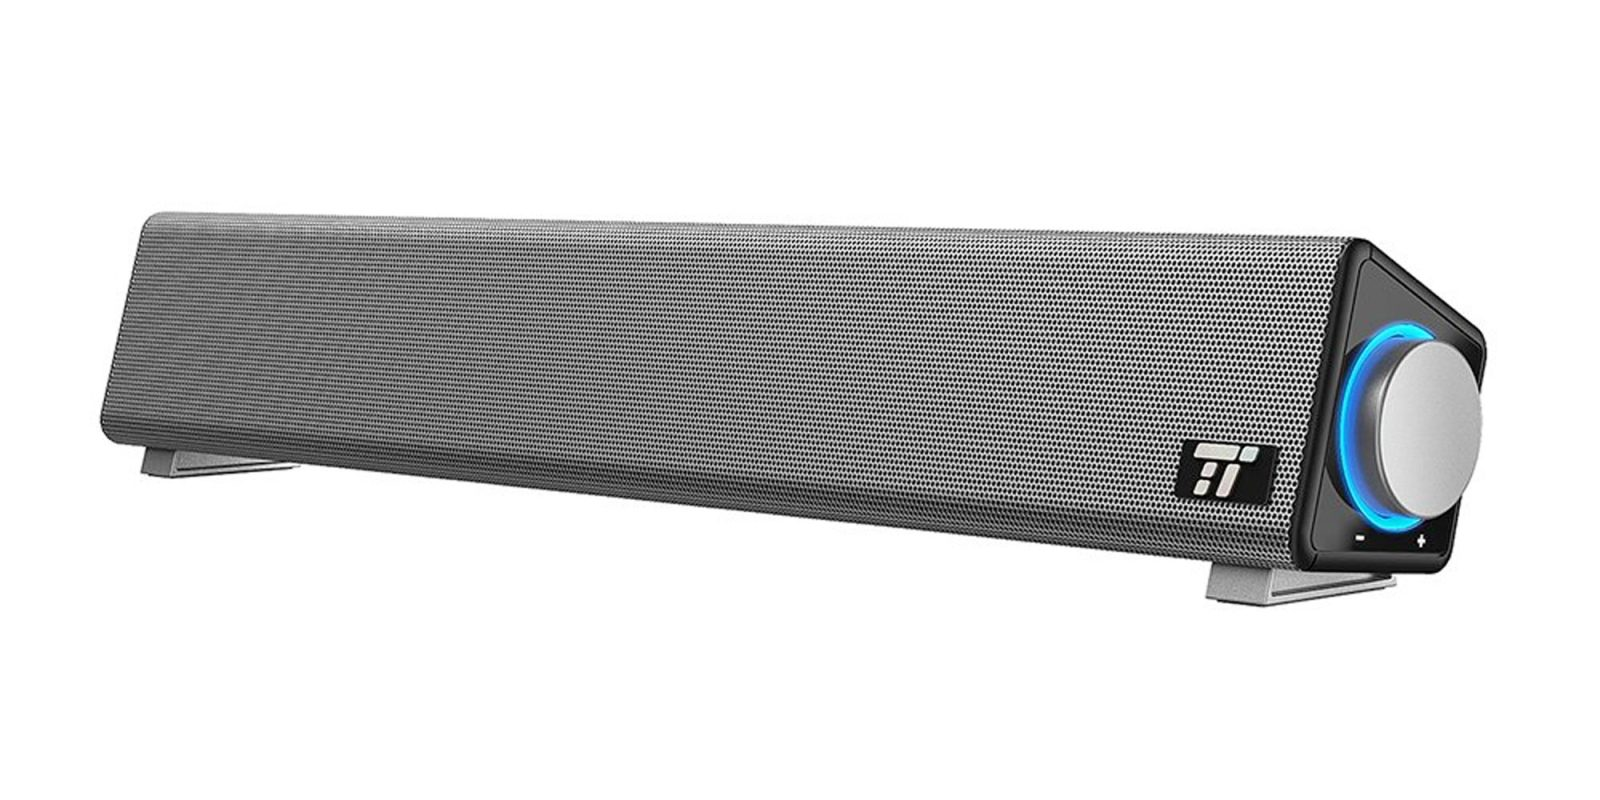 Upgrade your Mac mini's speakers w/ this USB soundbar for $23.50 (Reg. $35)